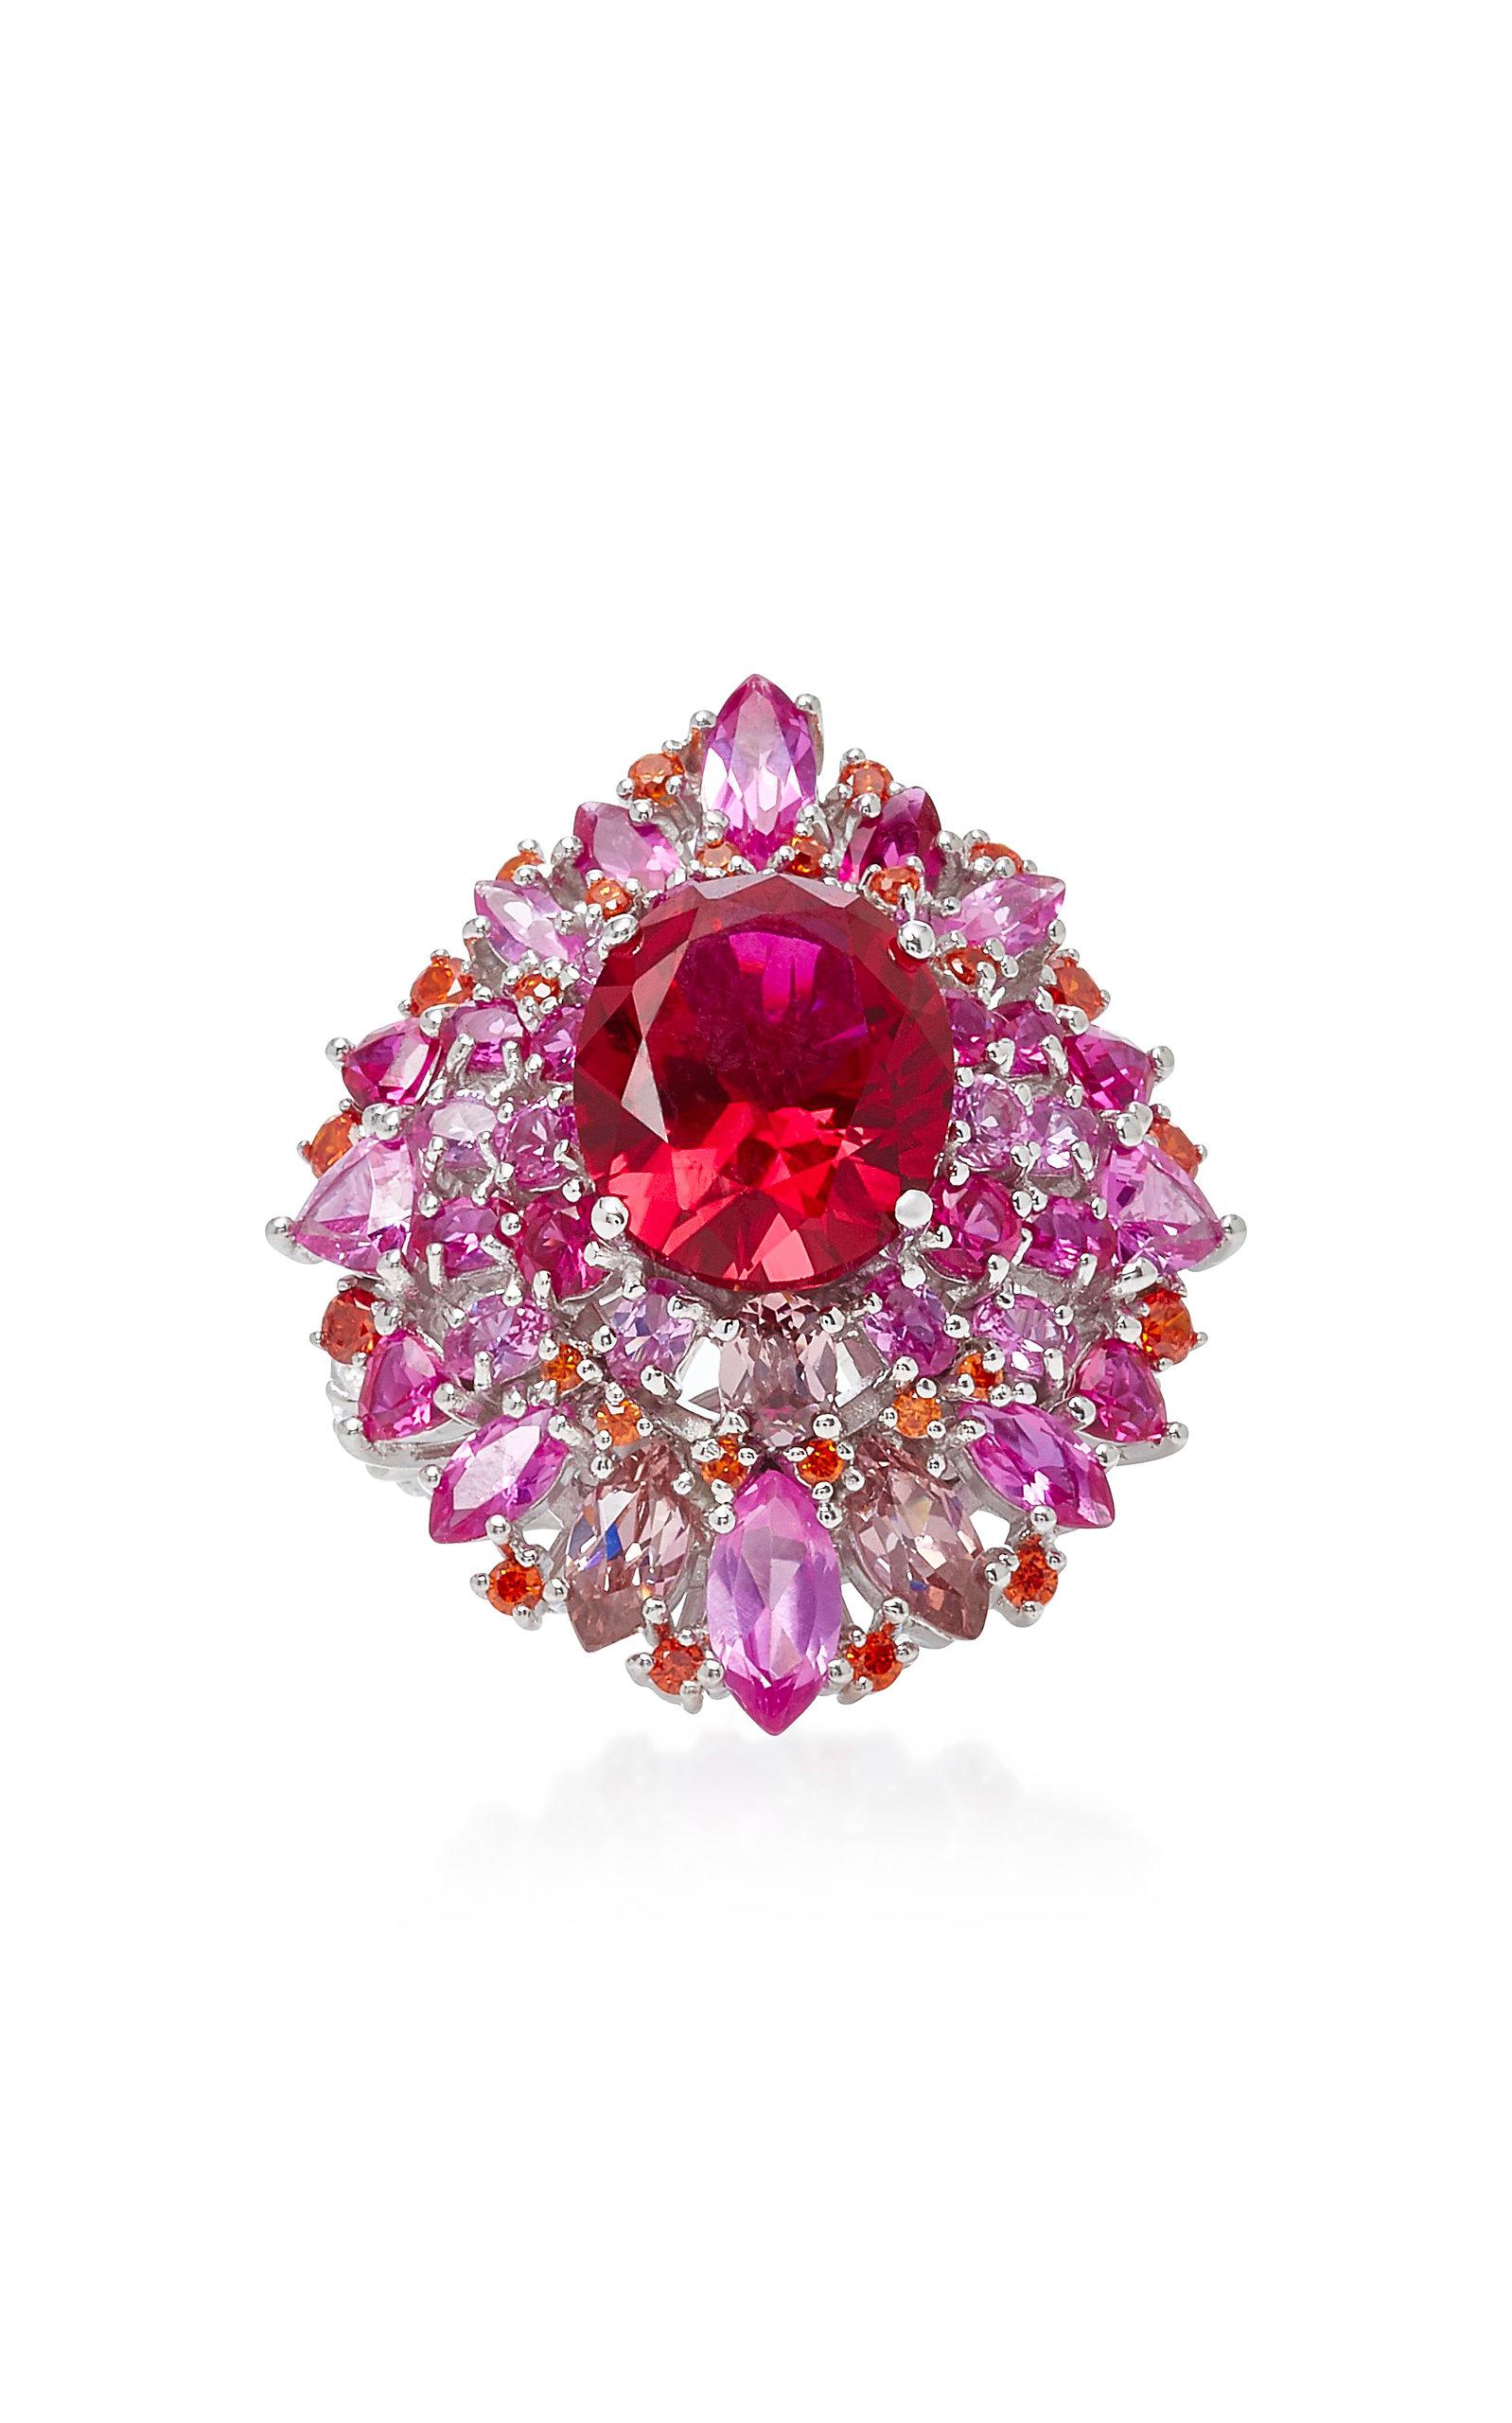 Women's Mirage Ruby 18K White Gold Vermeil Ring